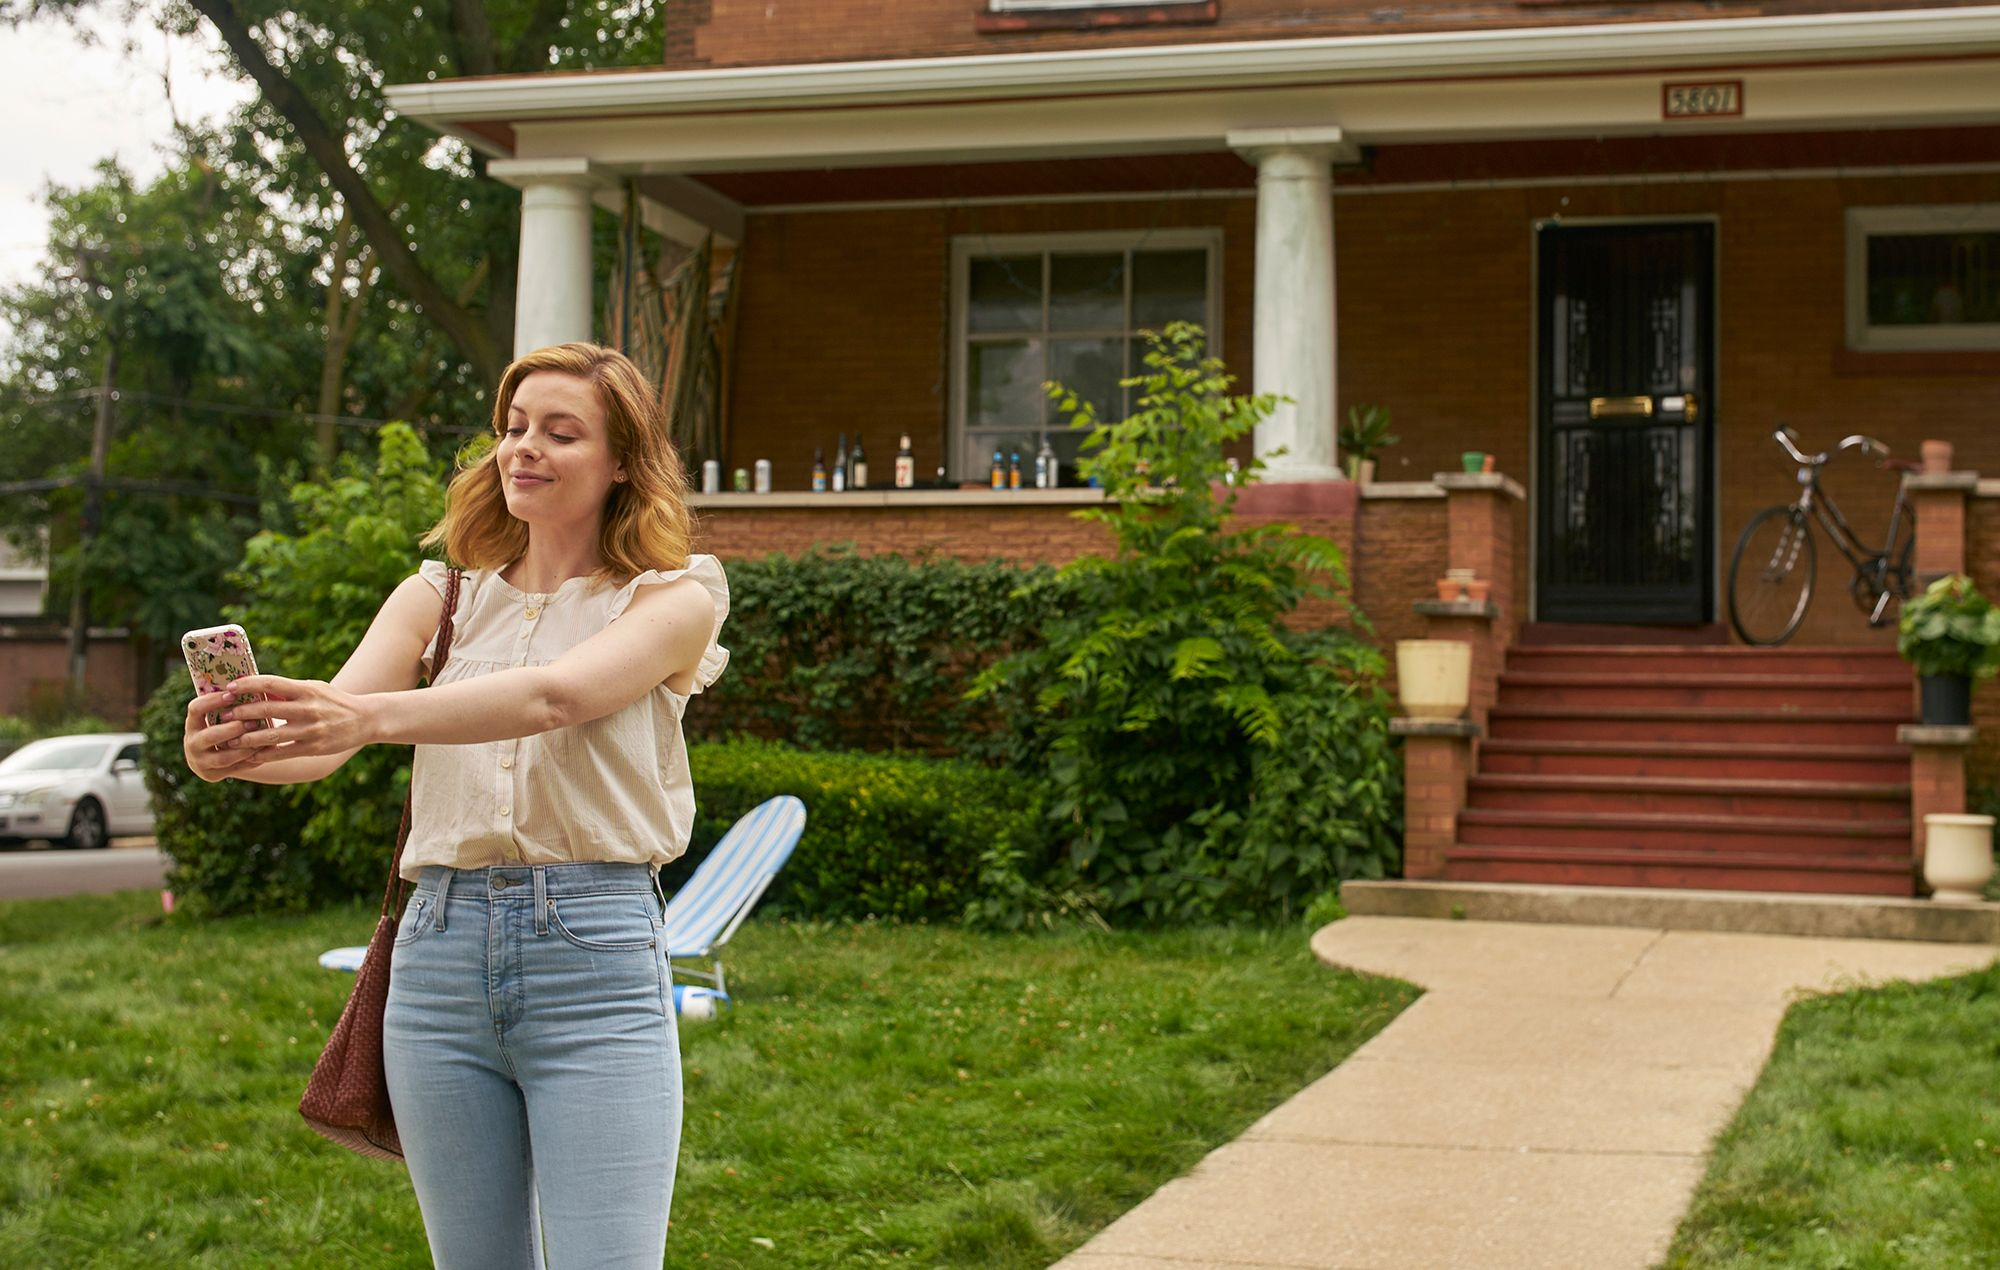 Gillian Jacobs 'I Use To Go Here' courtesy Gravitas Ventures